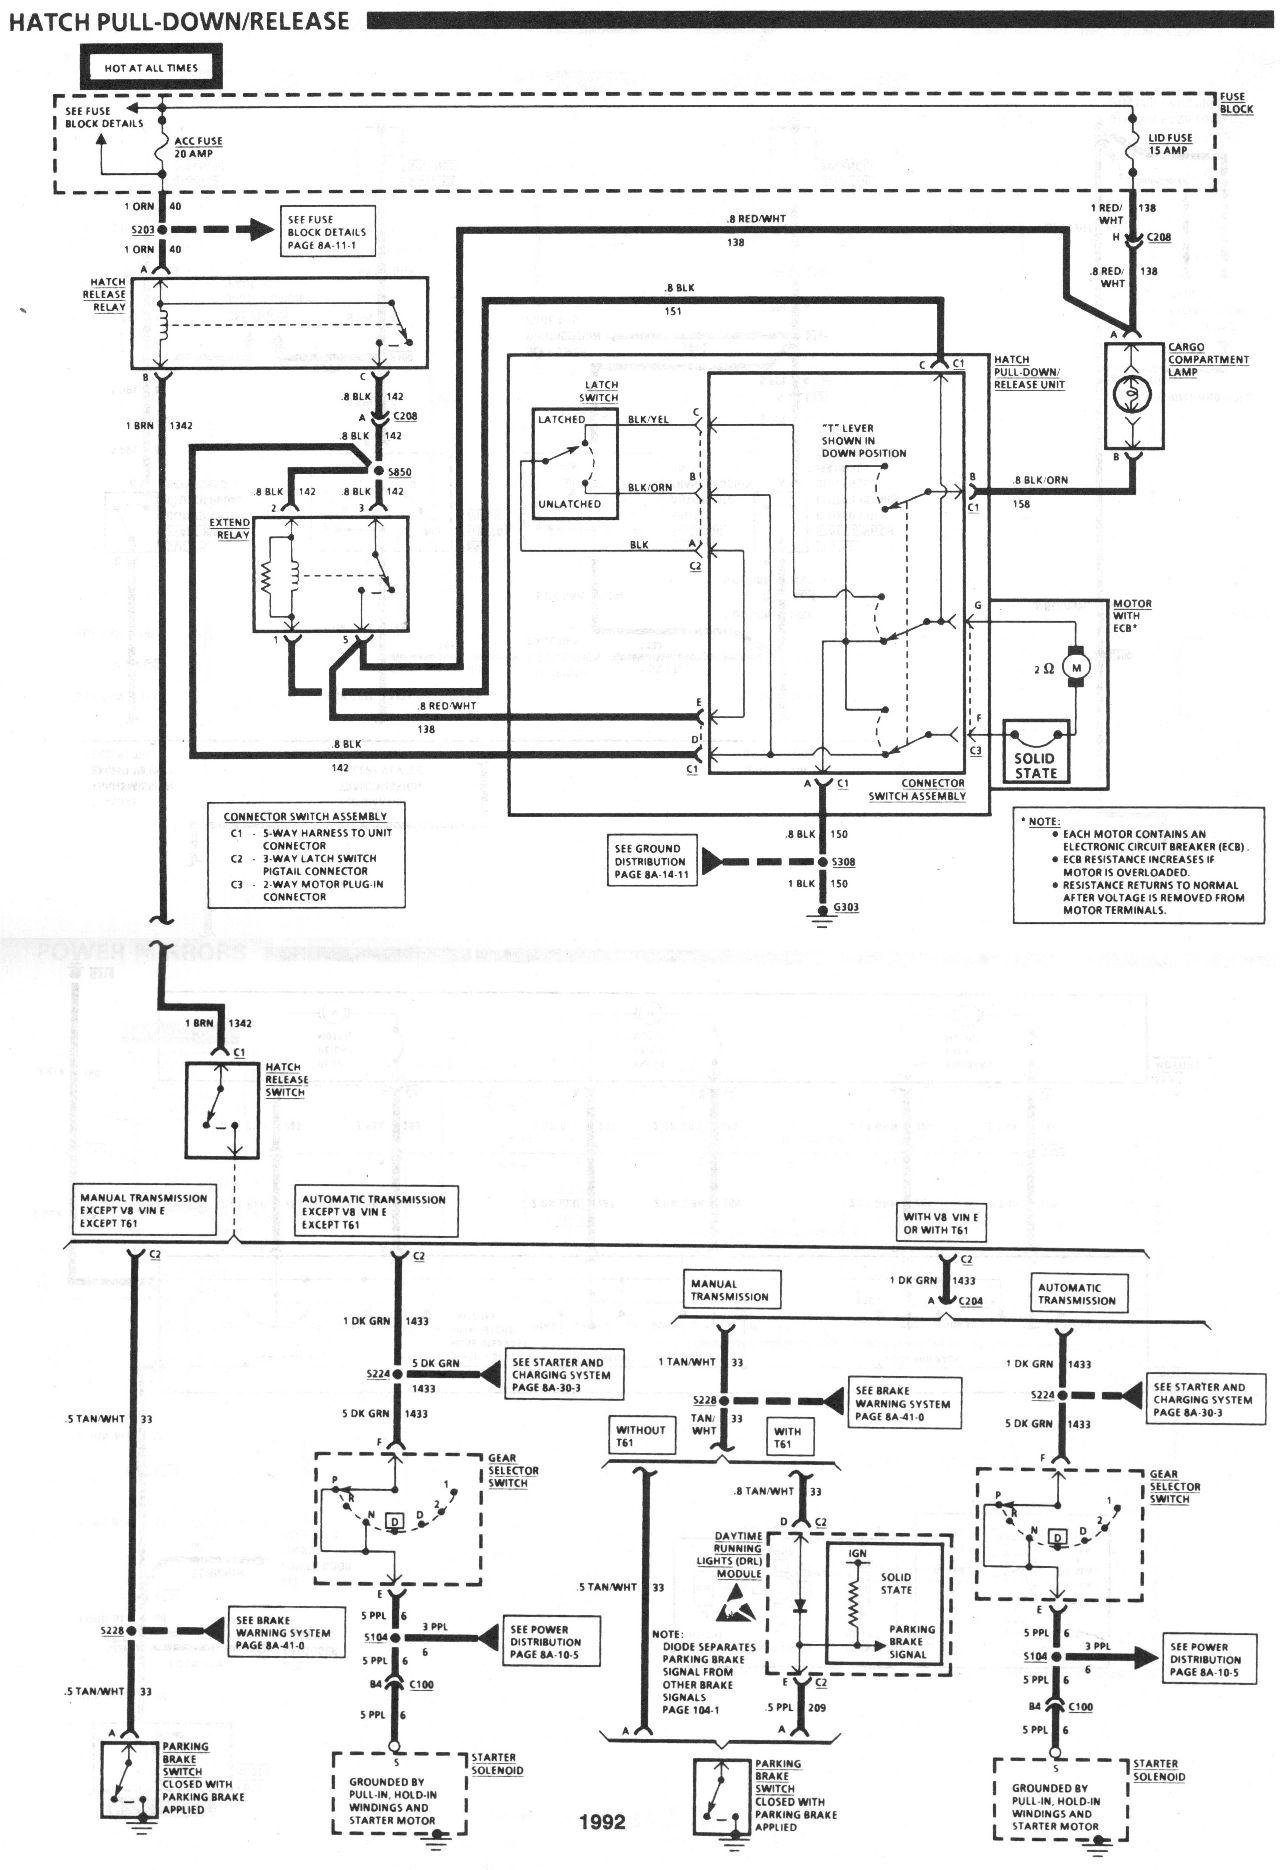 92 camaro hatch wiring diagram wiring diagram